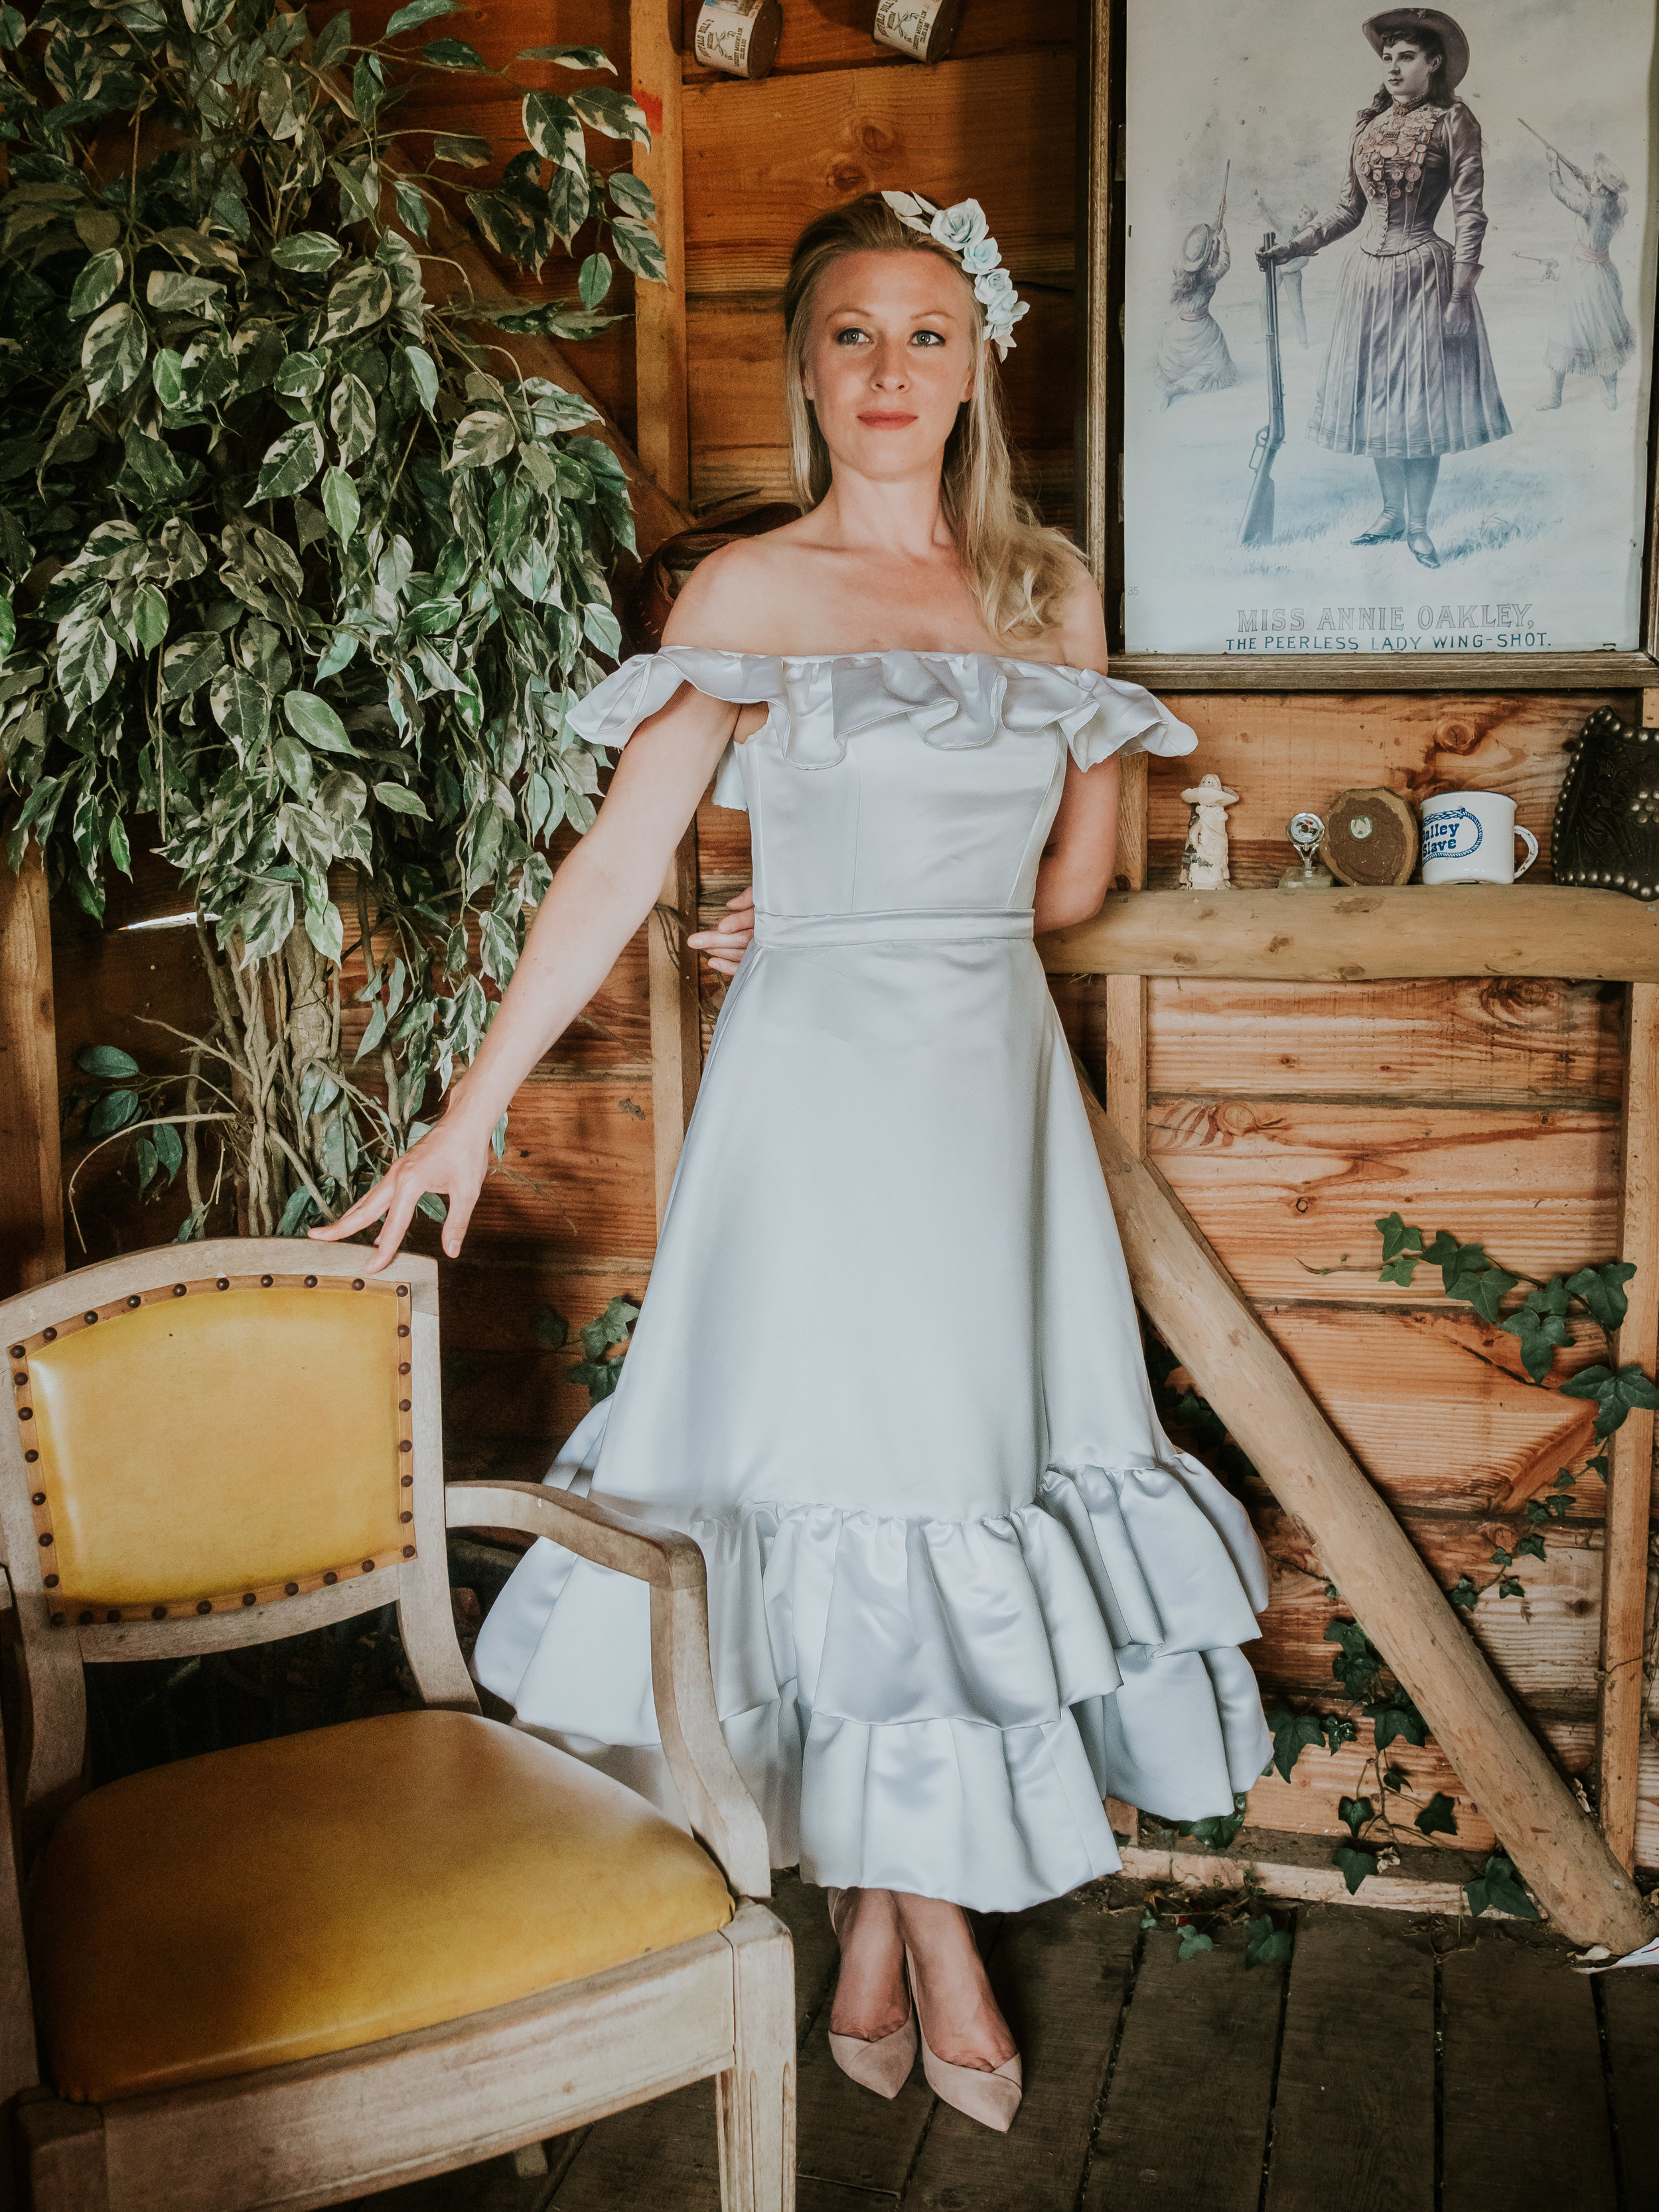 Jessica-Milberg-Photography-Brighton-London-Wedding-Fashion-Photographer-Creative-Wedding-Dress-101.jpg